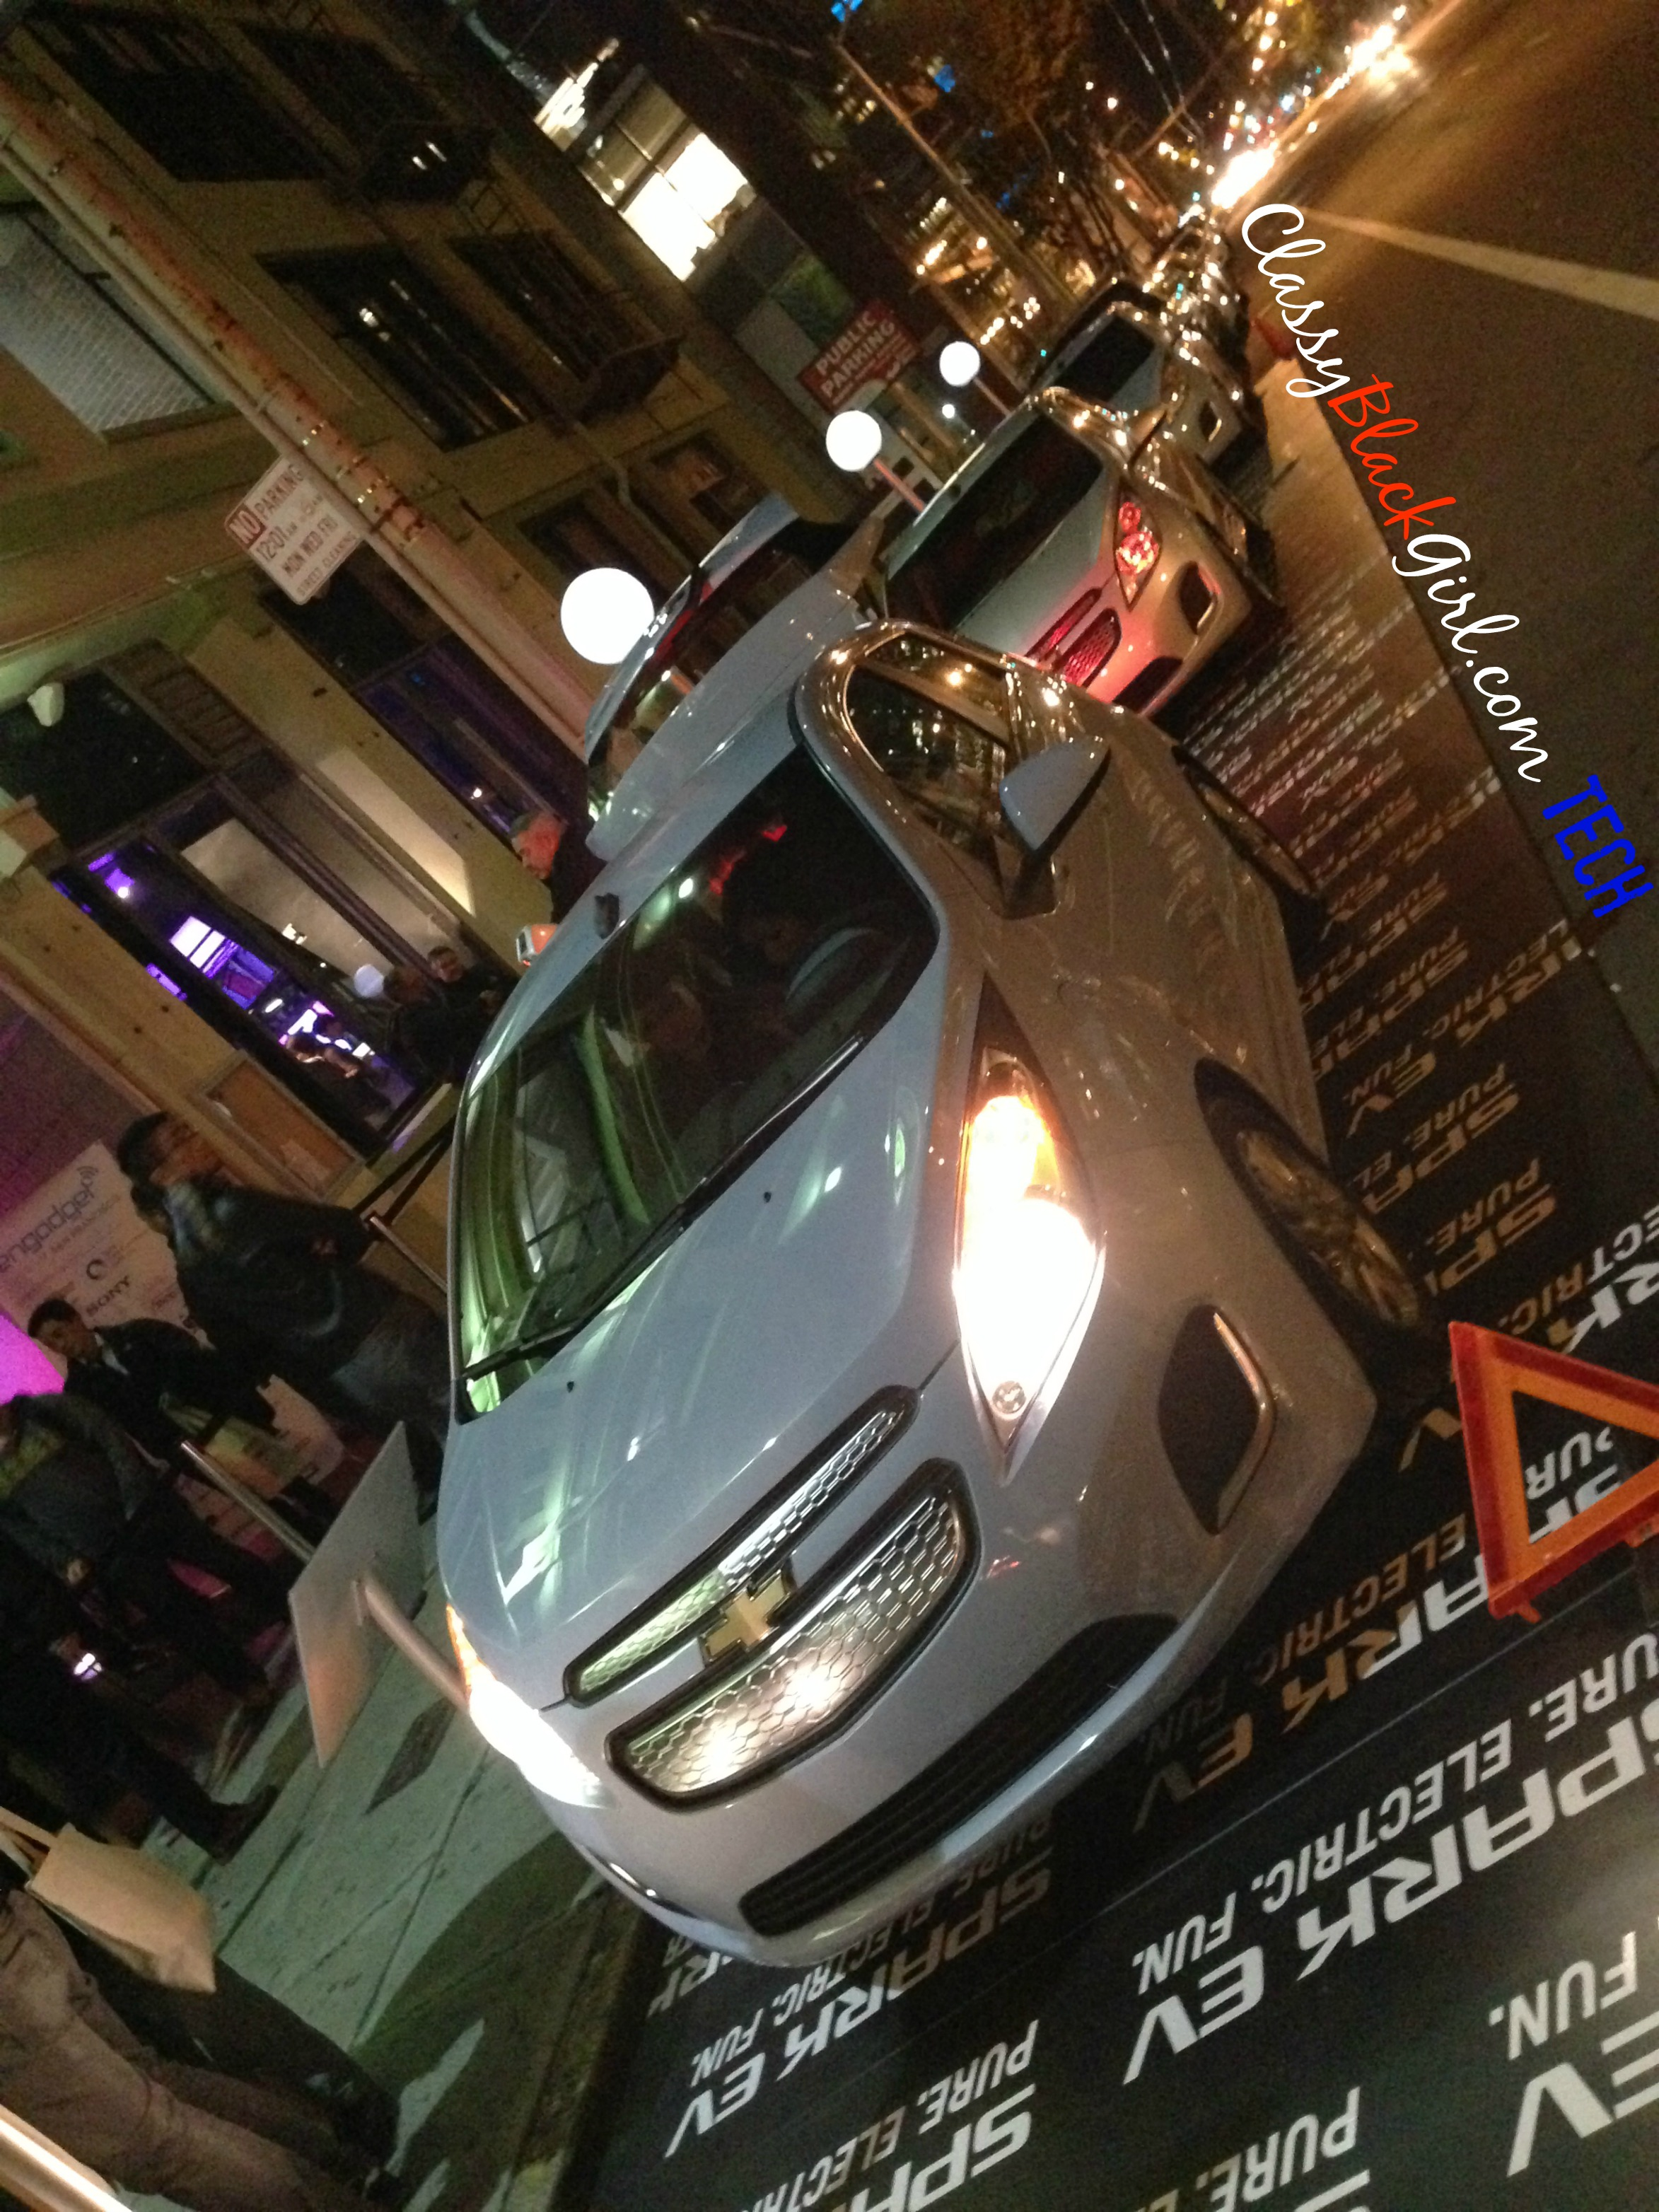 Chevrolet SPARK #engdgtSF ClassyBlackGirl Tech San Francisco